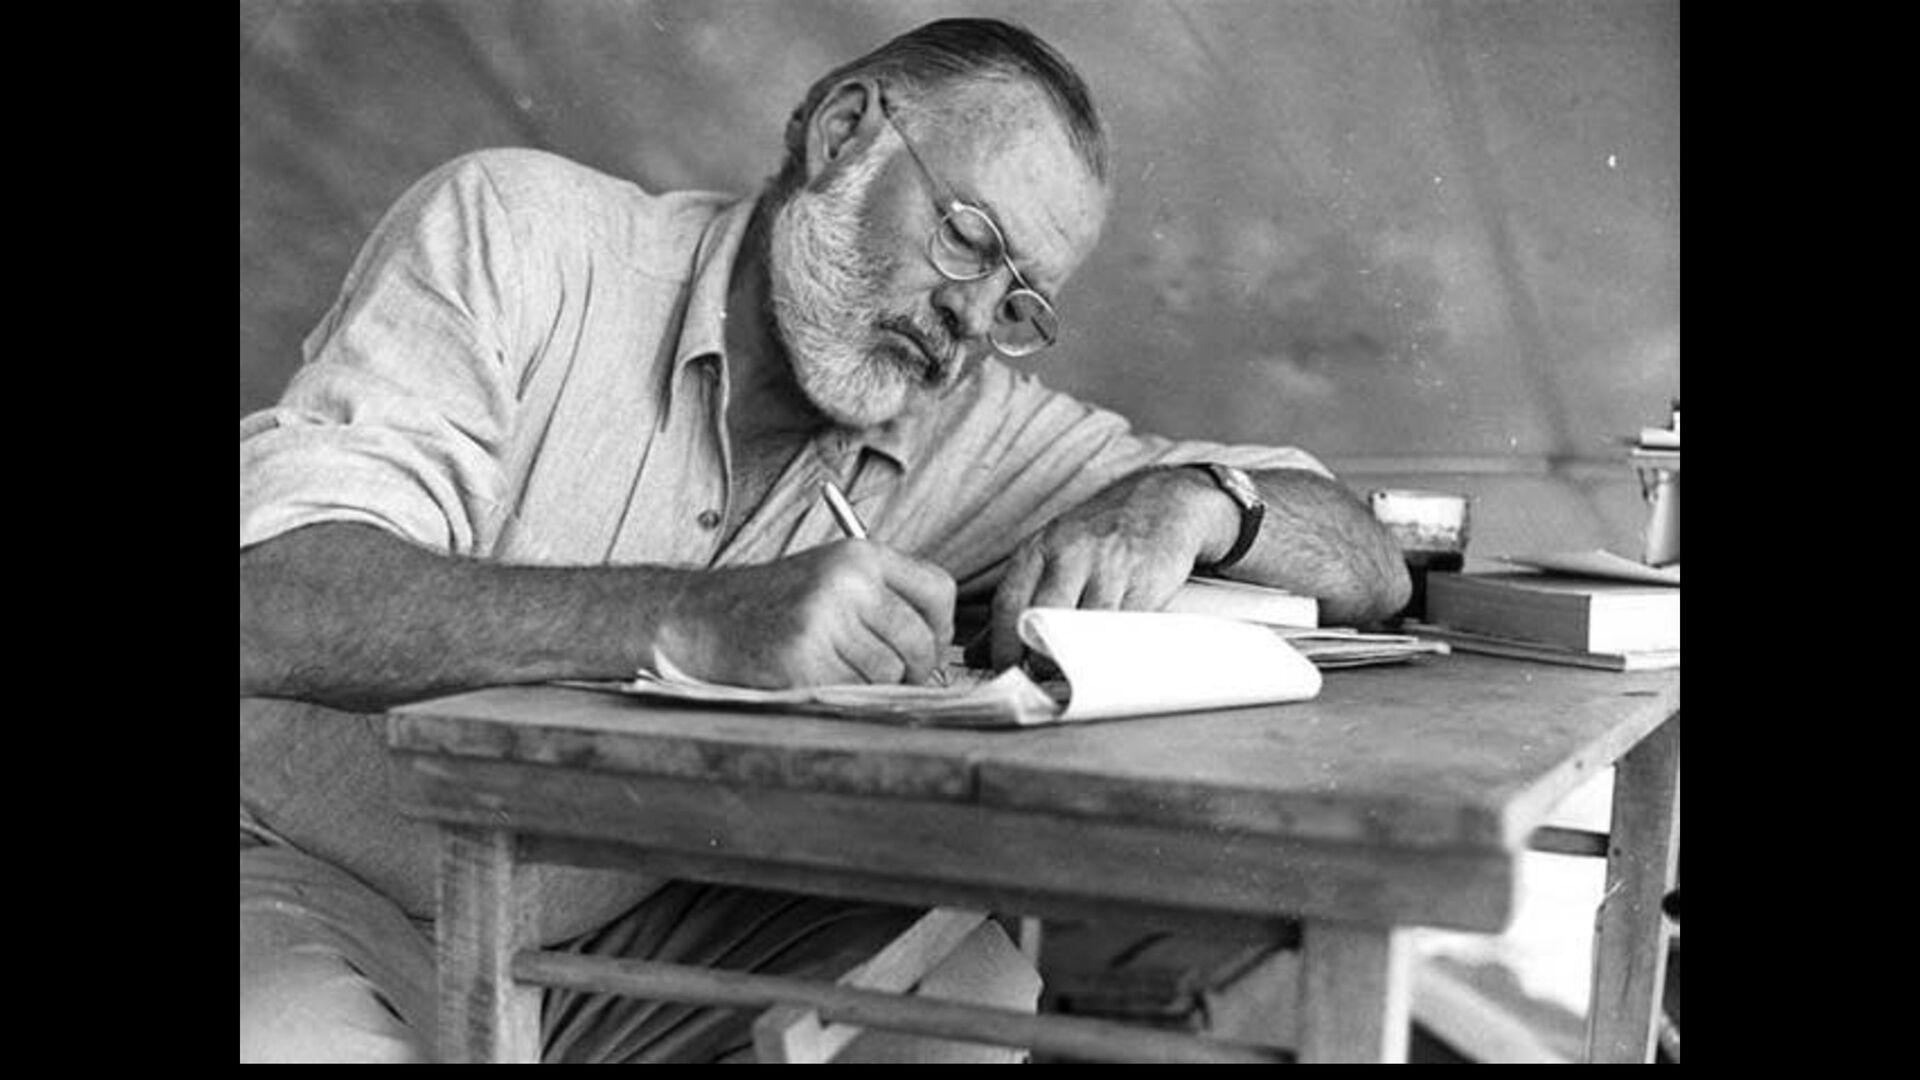 Neil Gaiman on productivity 'Write. 'Put one wo...